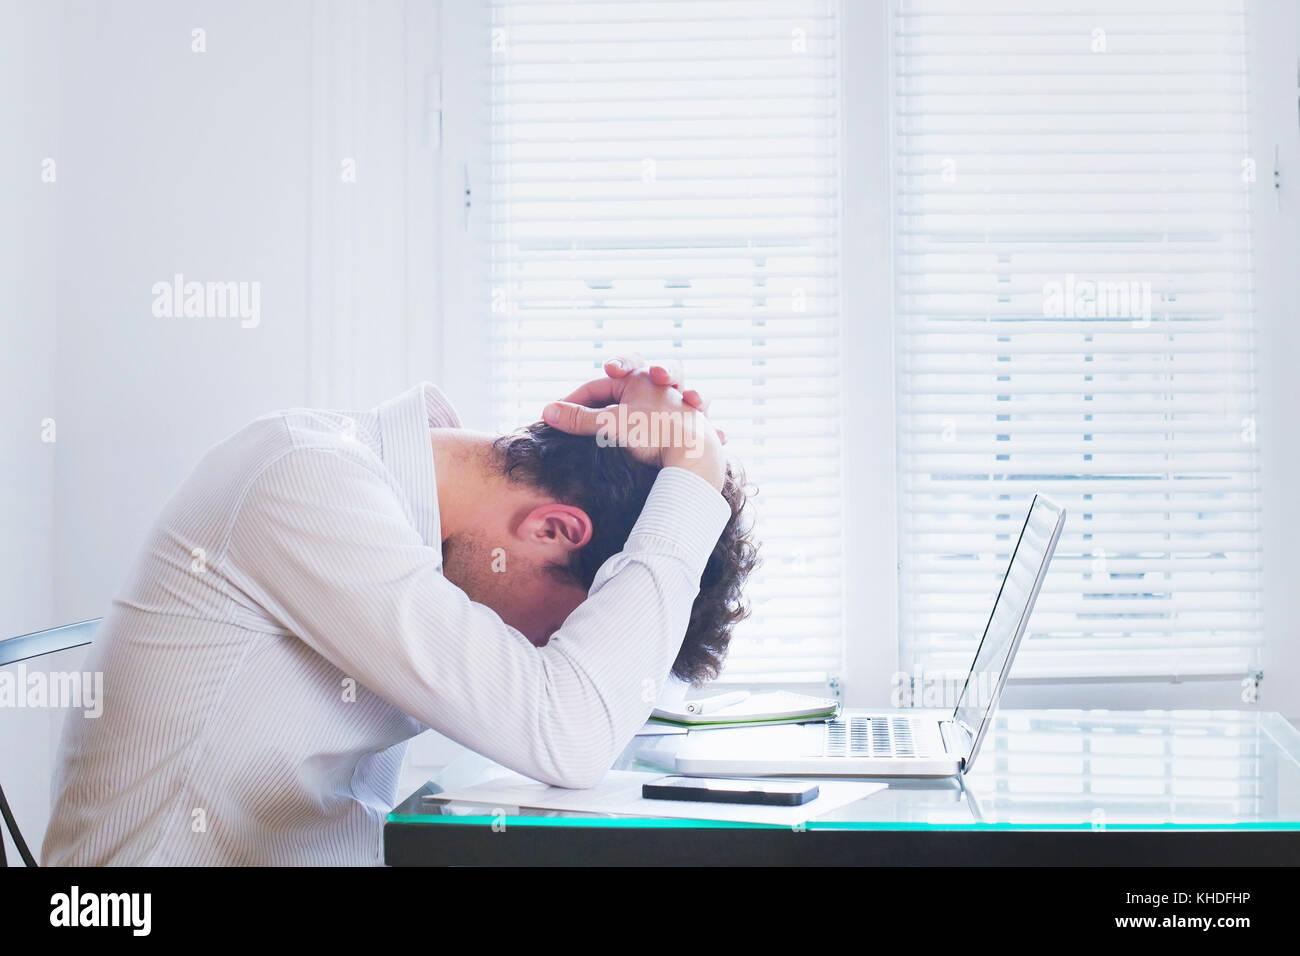 Emotionalen Burnout, müde Geschäftsmann am Arbeitsplatz im Büro, Stress Konzept Stockbild